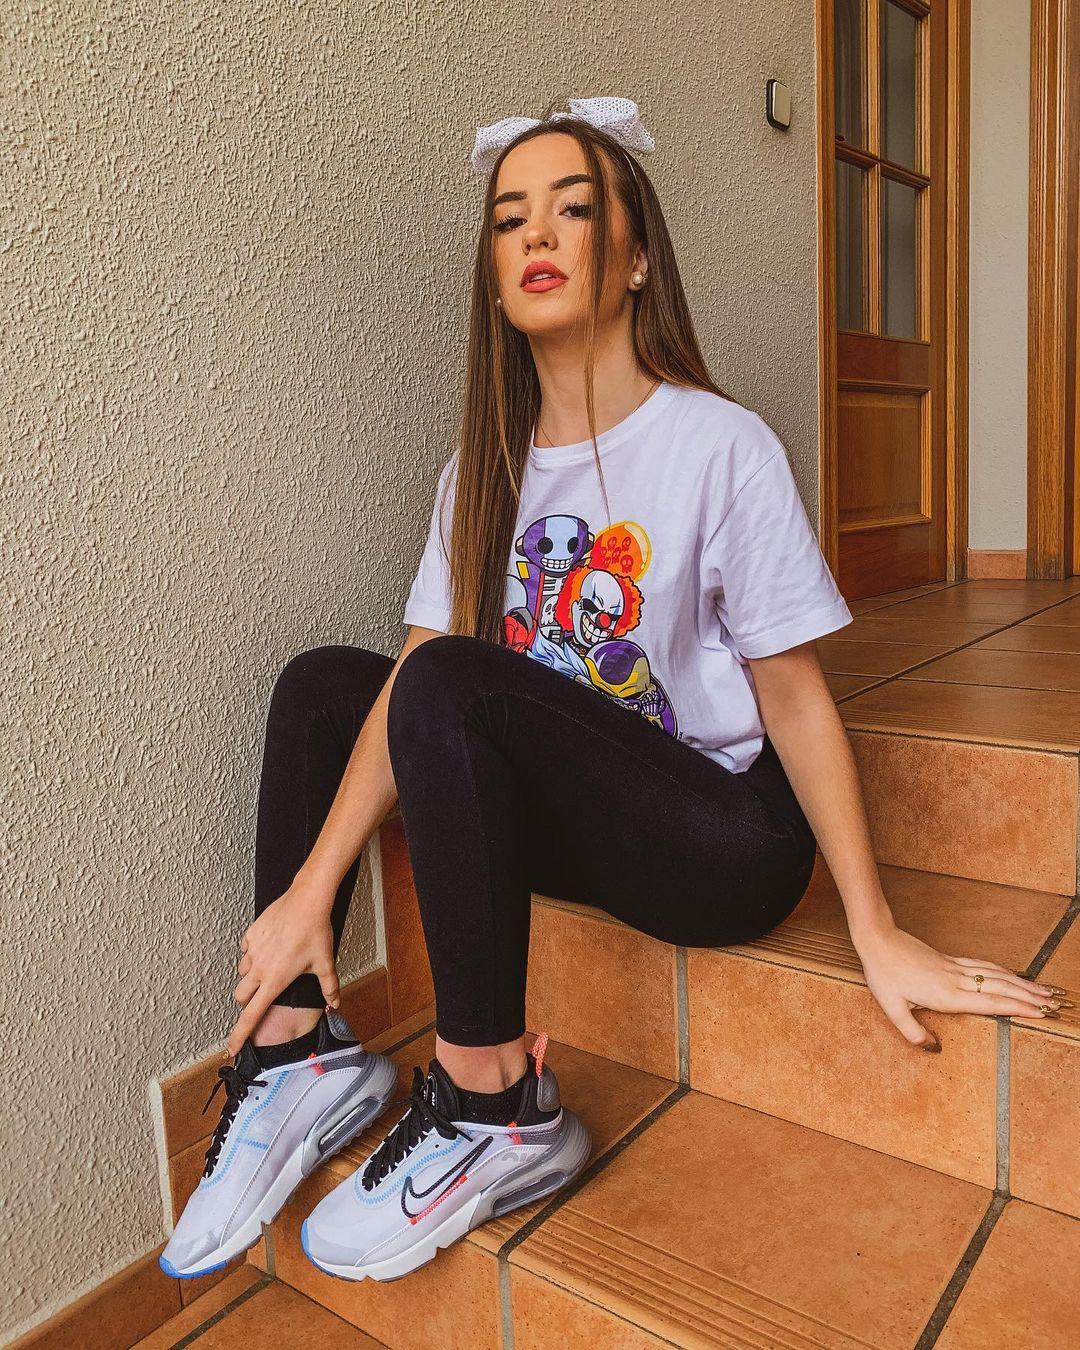 Lidia-Rauet-Wallpapers-Insta-Fit-Bio-4